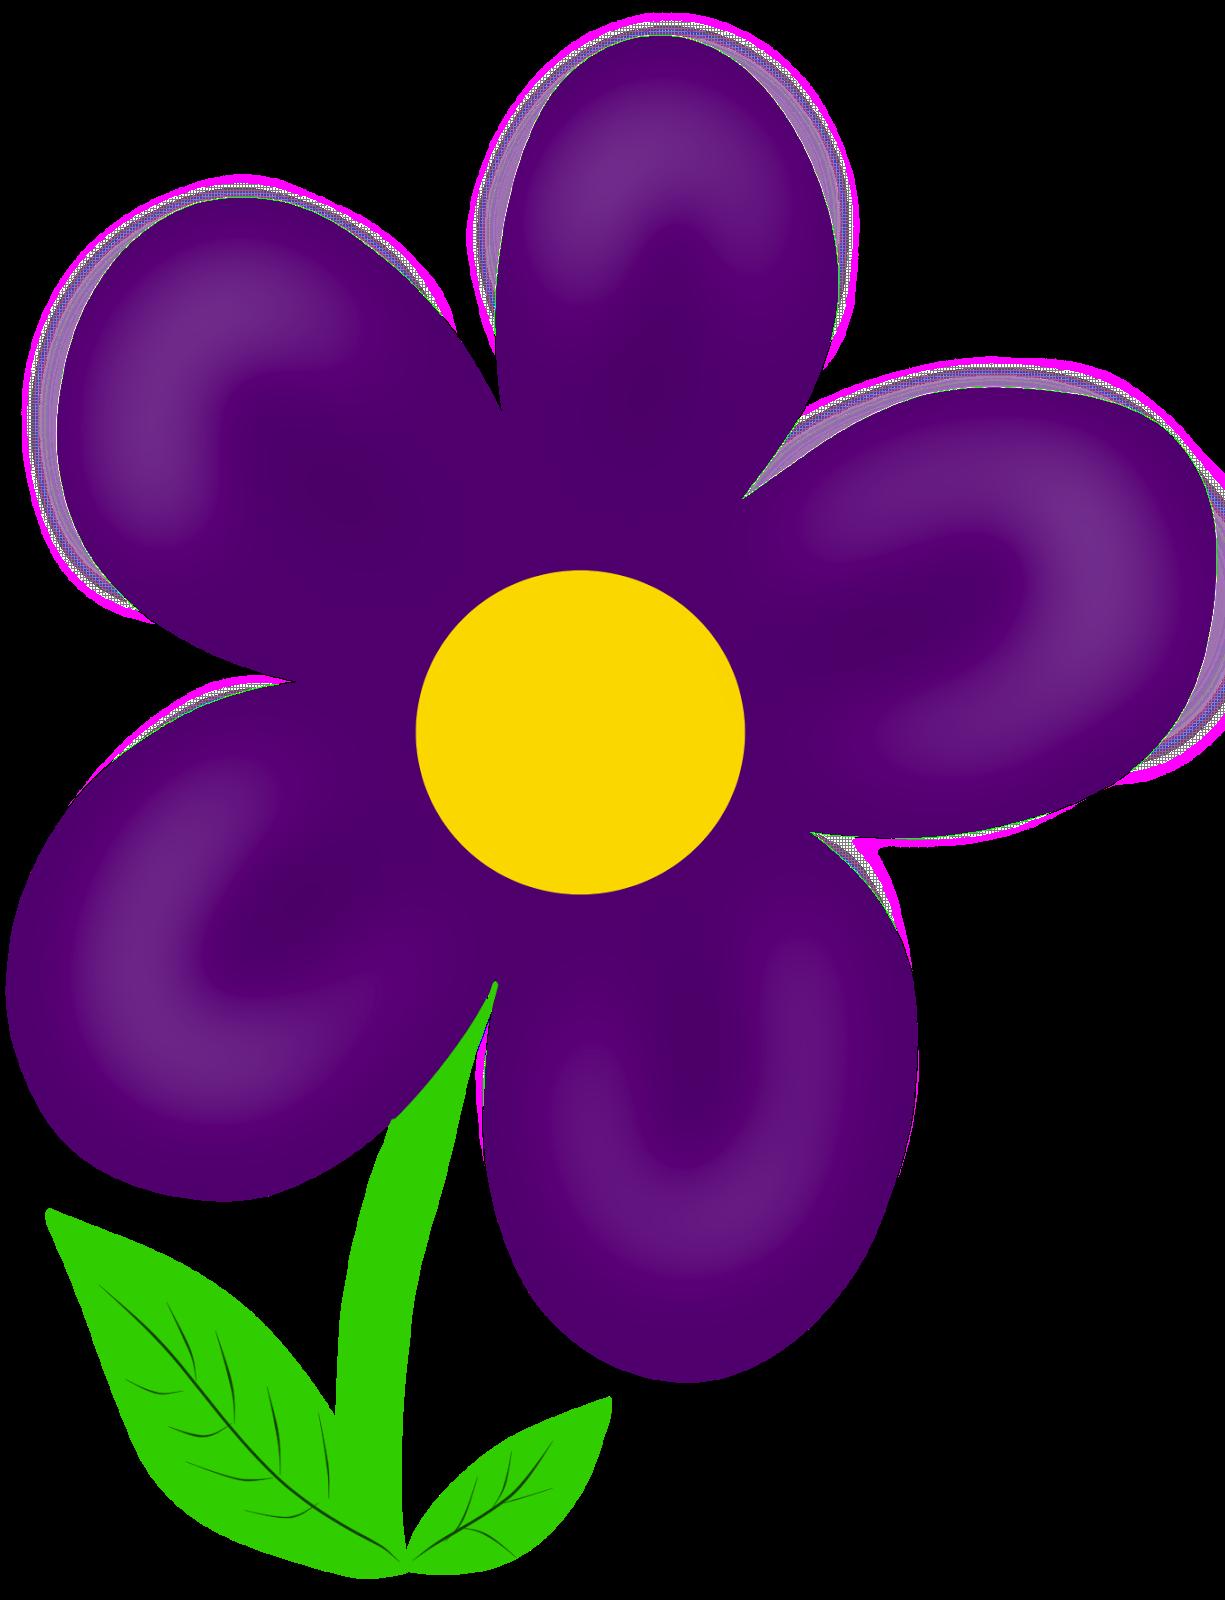 Flower clipart png. Summer flowers panda free